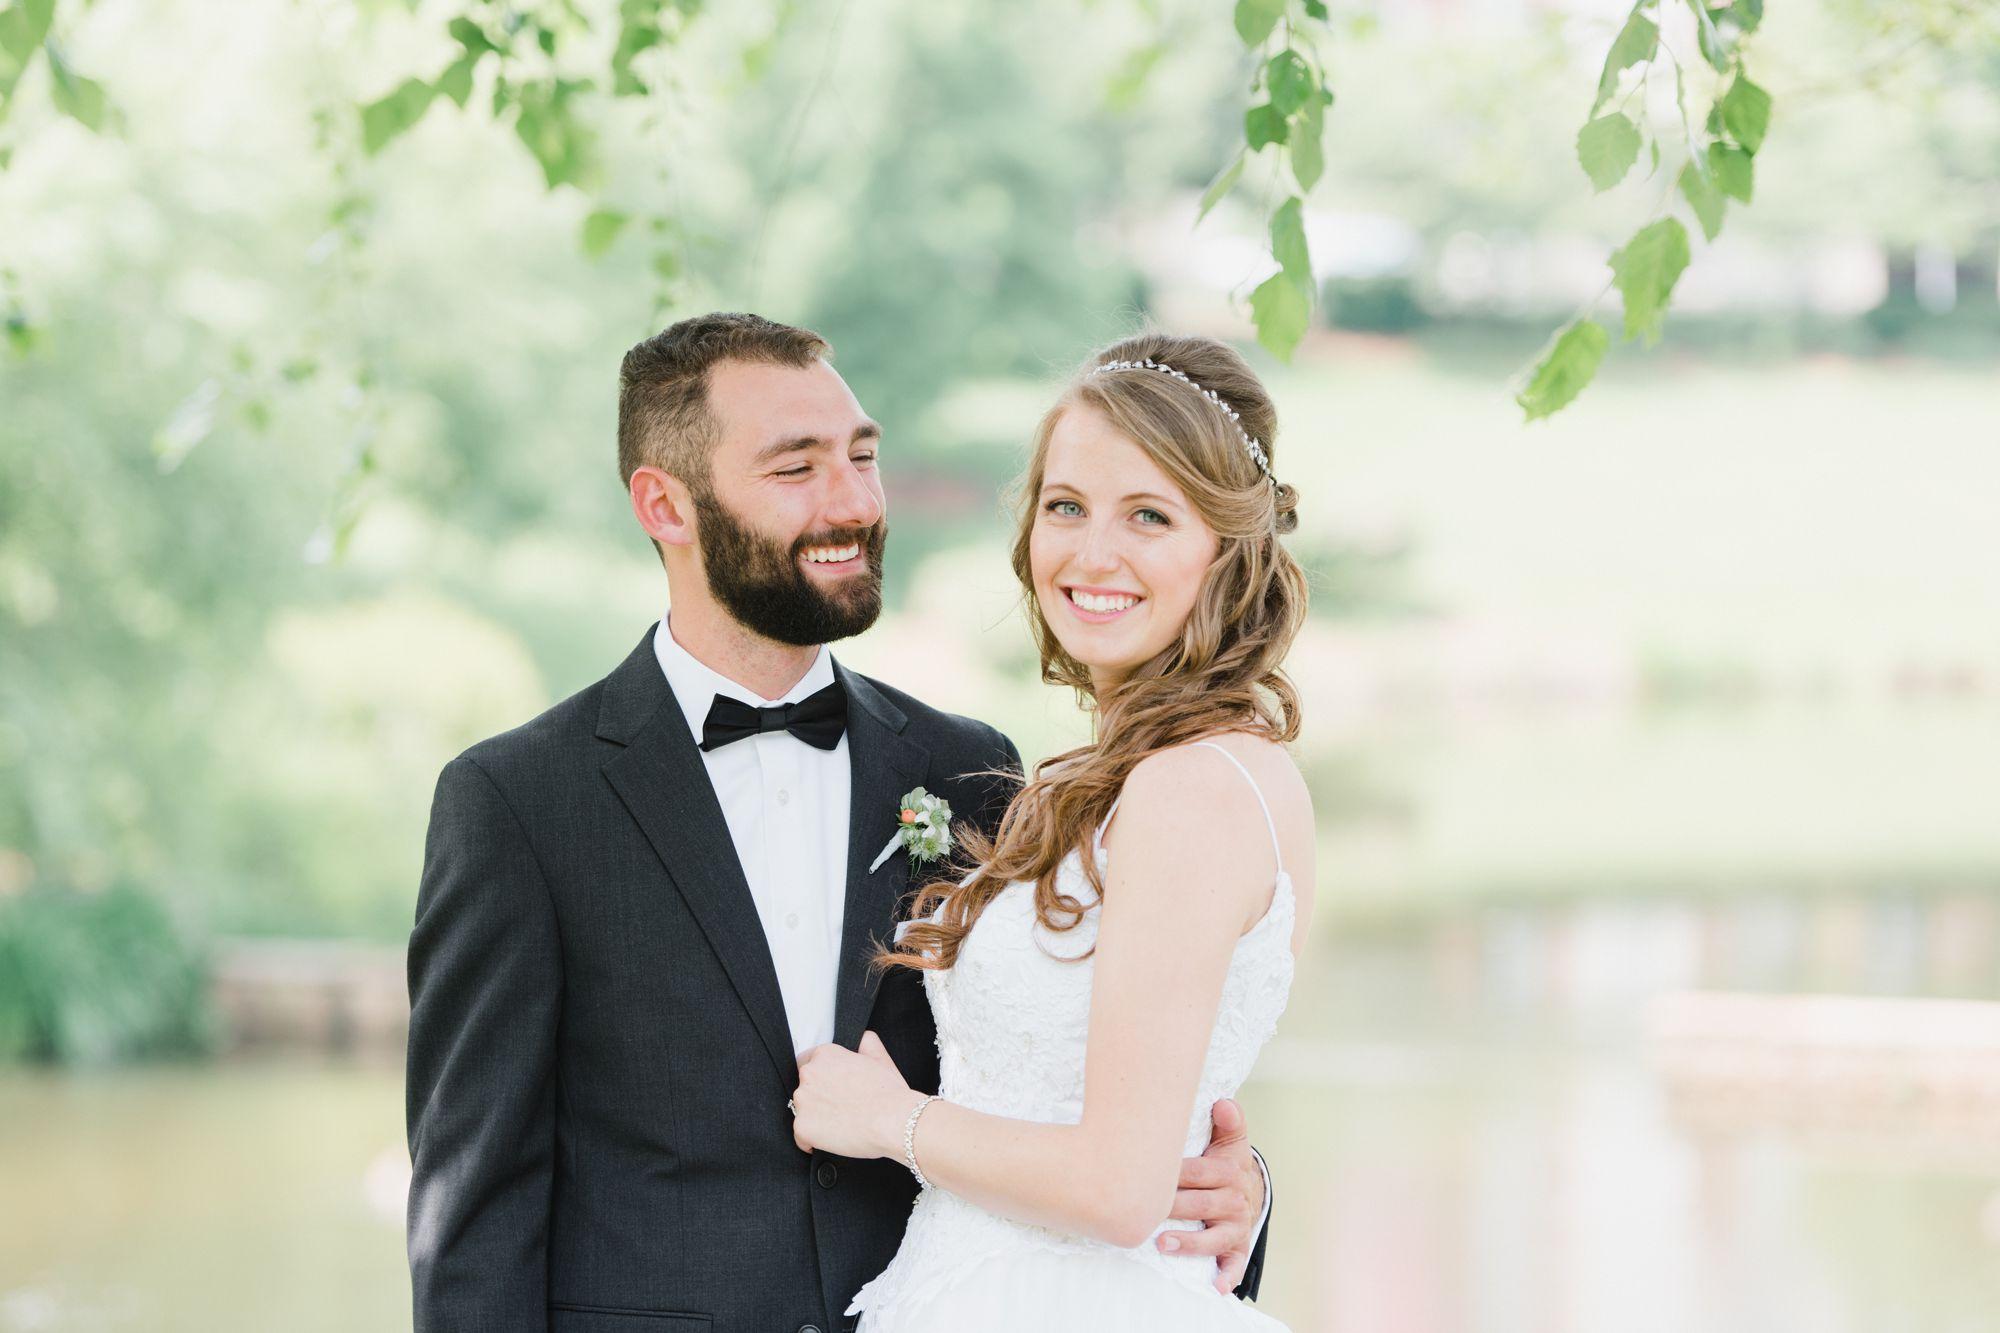 uptown-charlotte-orthodox-greek-wedding 36